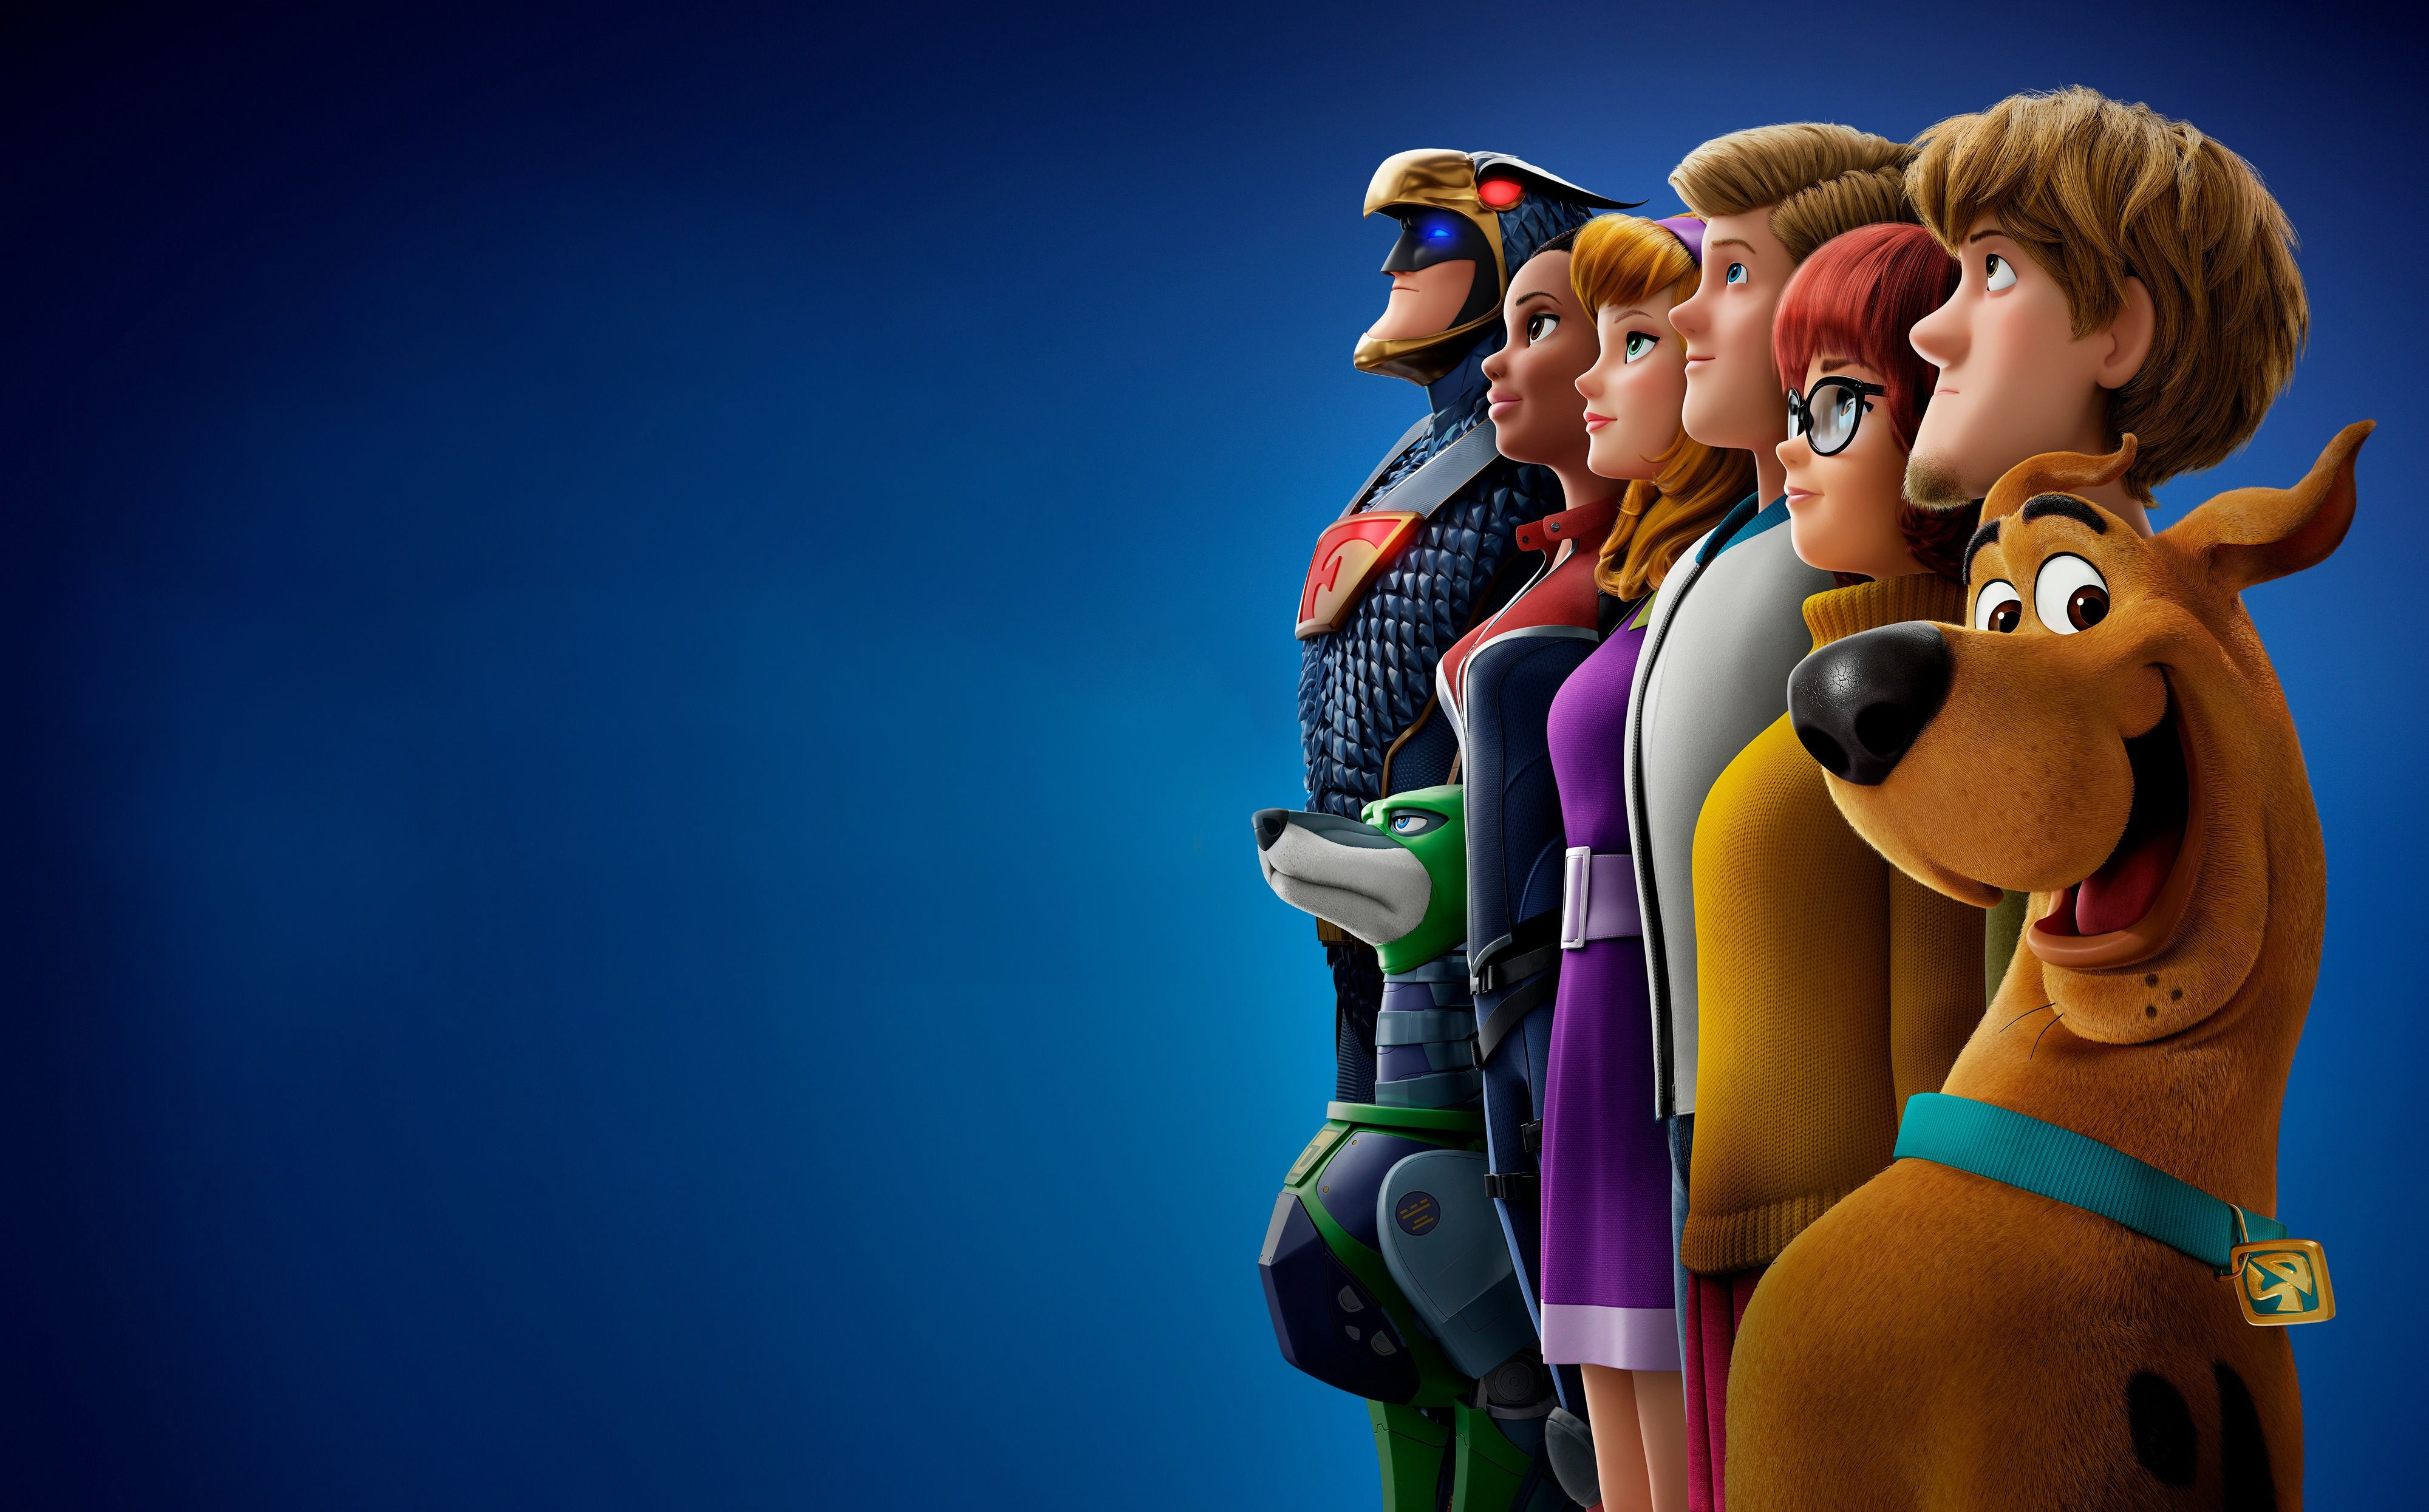 Scoob 2020 Scoob 2020 Movie Wallpapers 4k Scoob 2020 4k Wallpapers Movie Wallpapers Scooby Scooby Doo